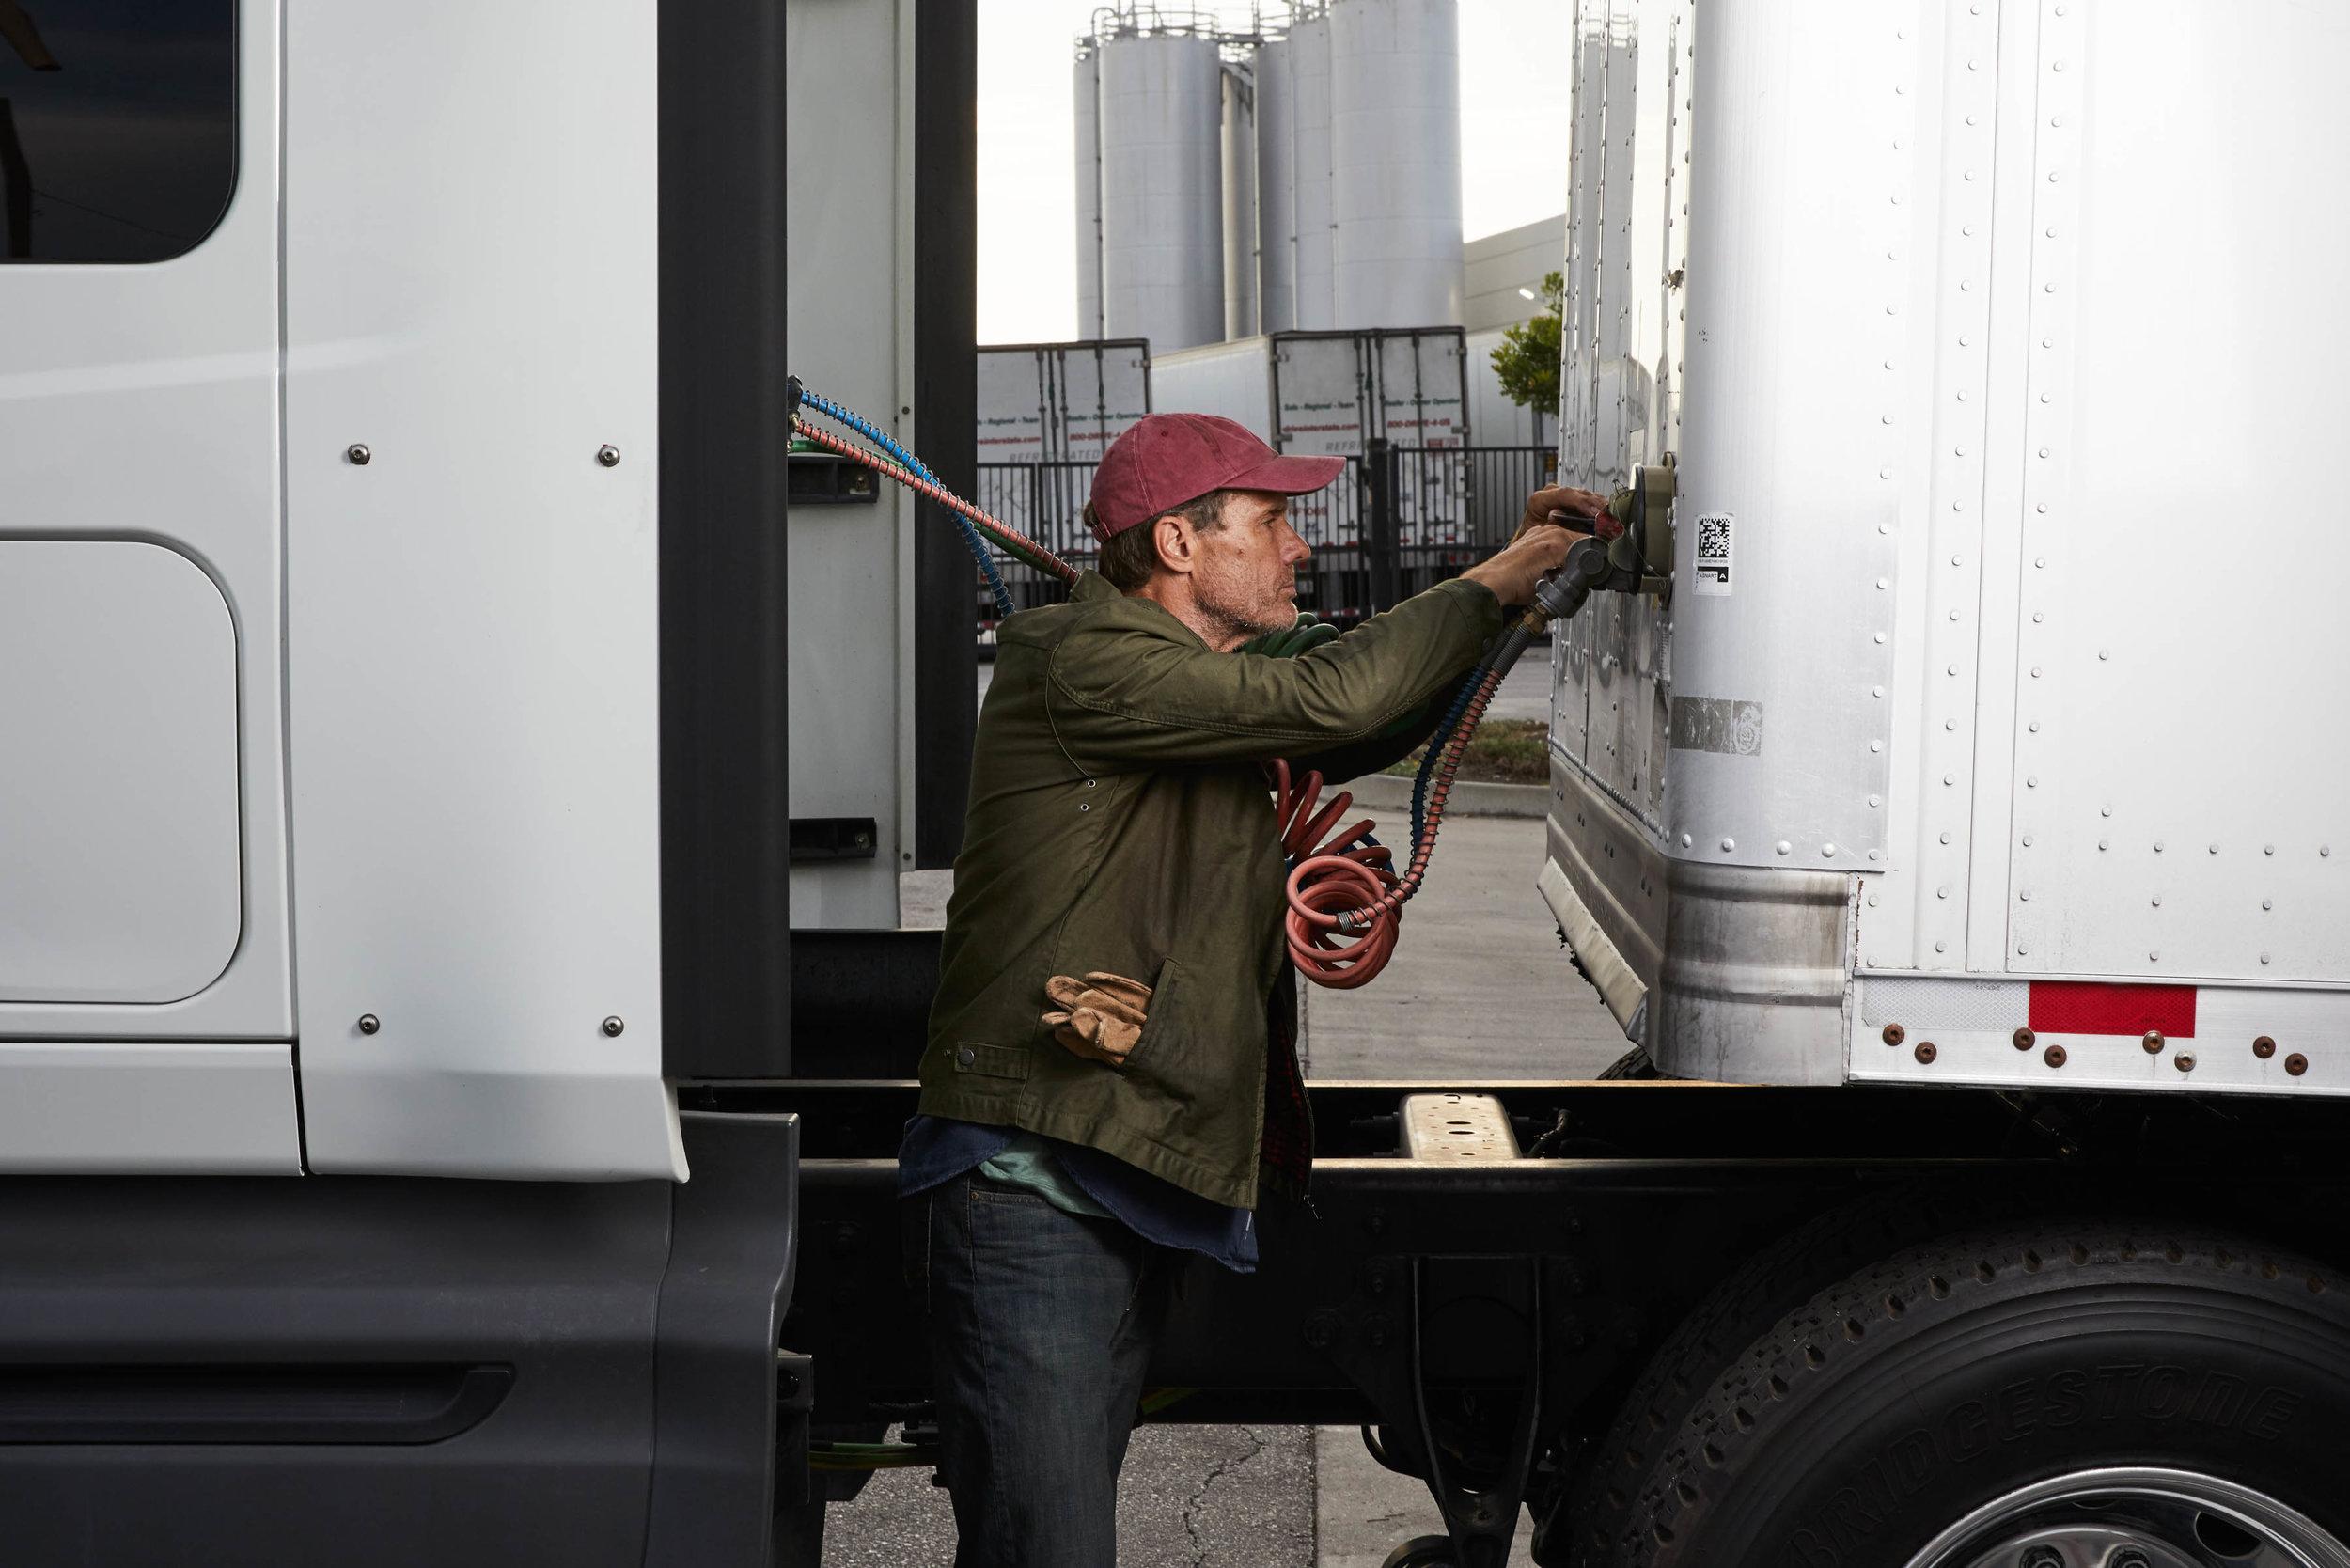 UF_Truck_Hitching_&_Un-Hitching-0004.jpg